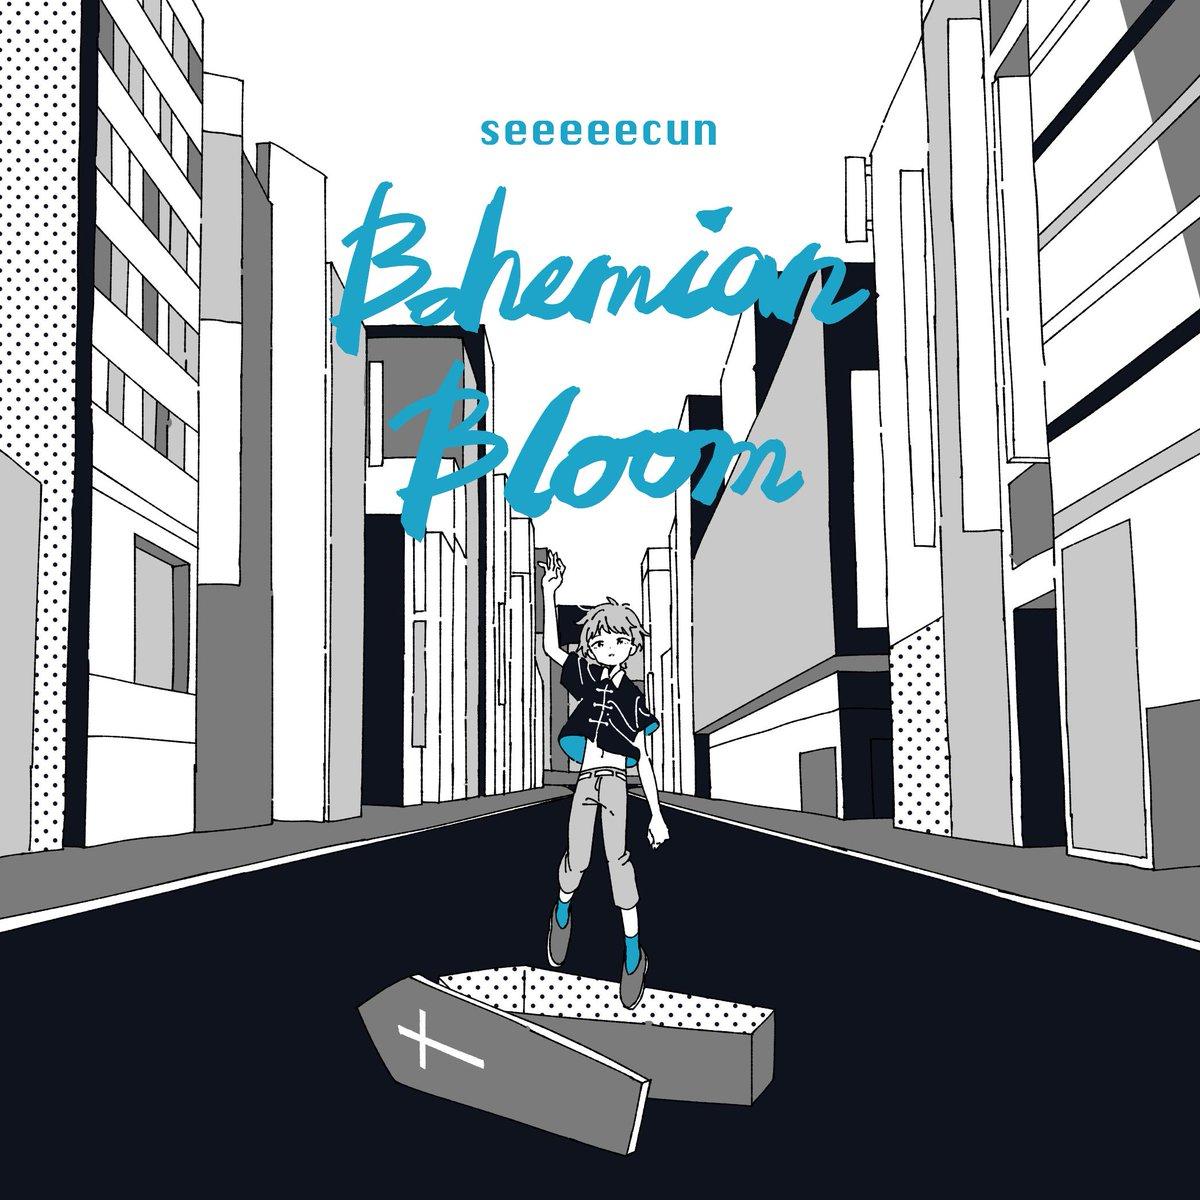 『seeeeecun - ハンマーヘッズ』収録の『Bohemian Bloom』ジャケット